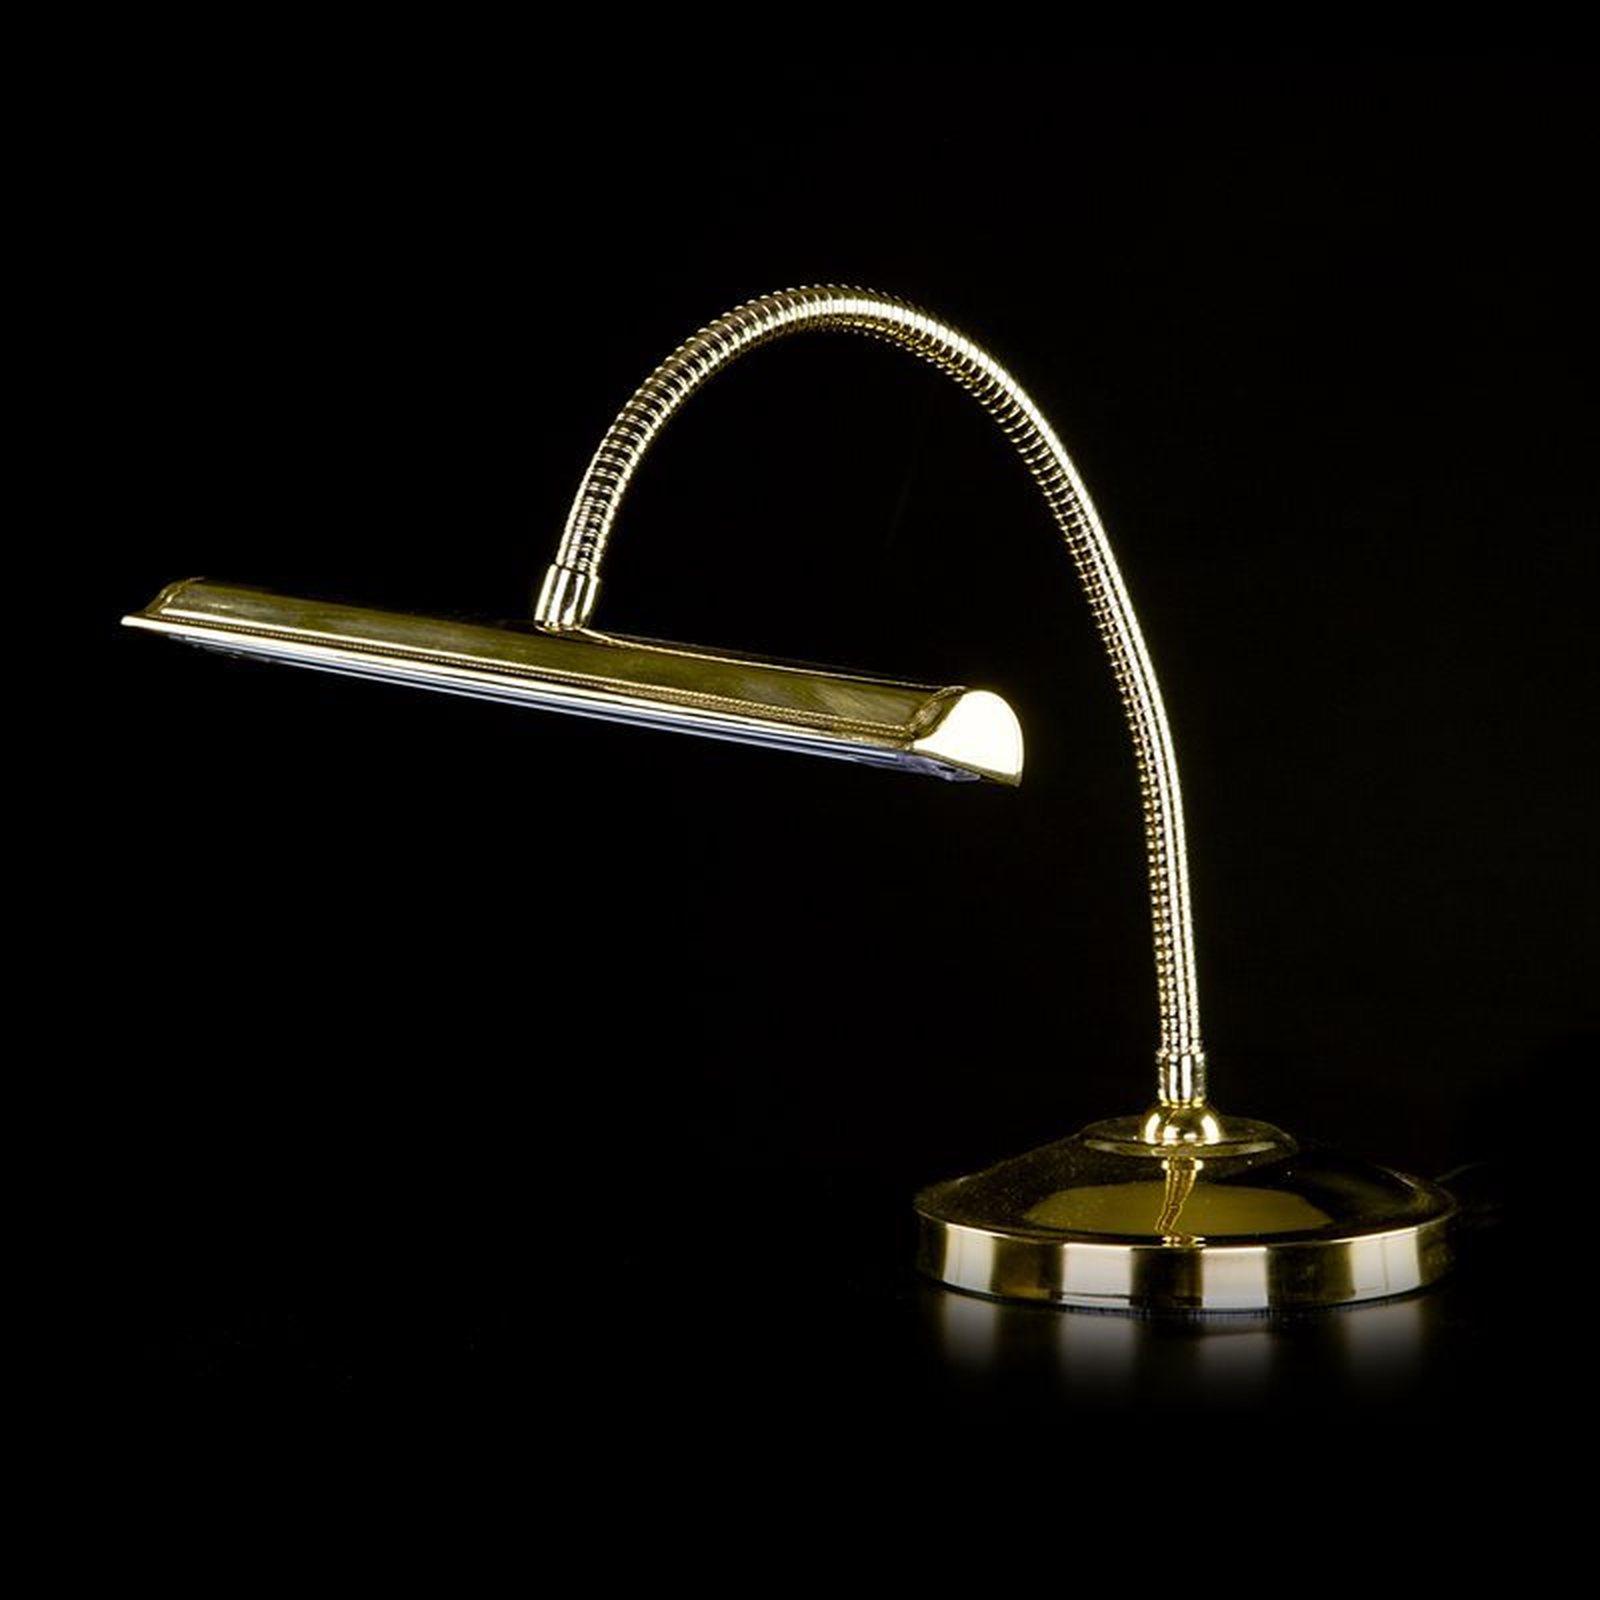 đèn bàn pha lê